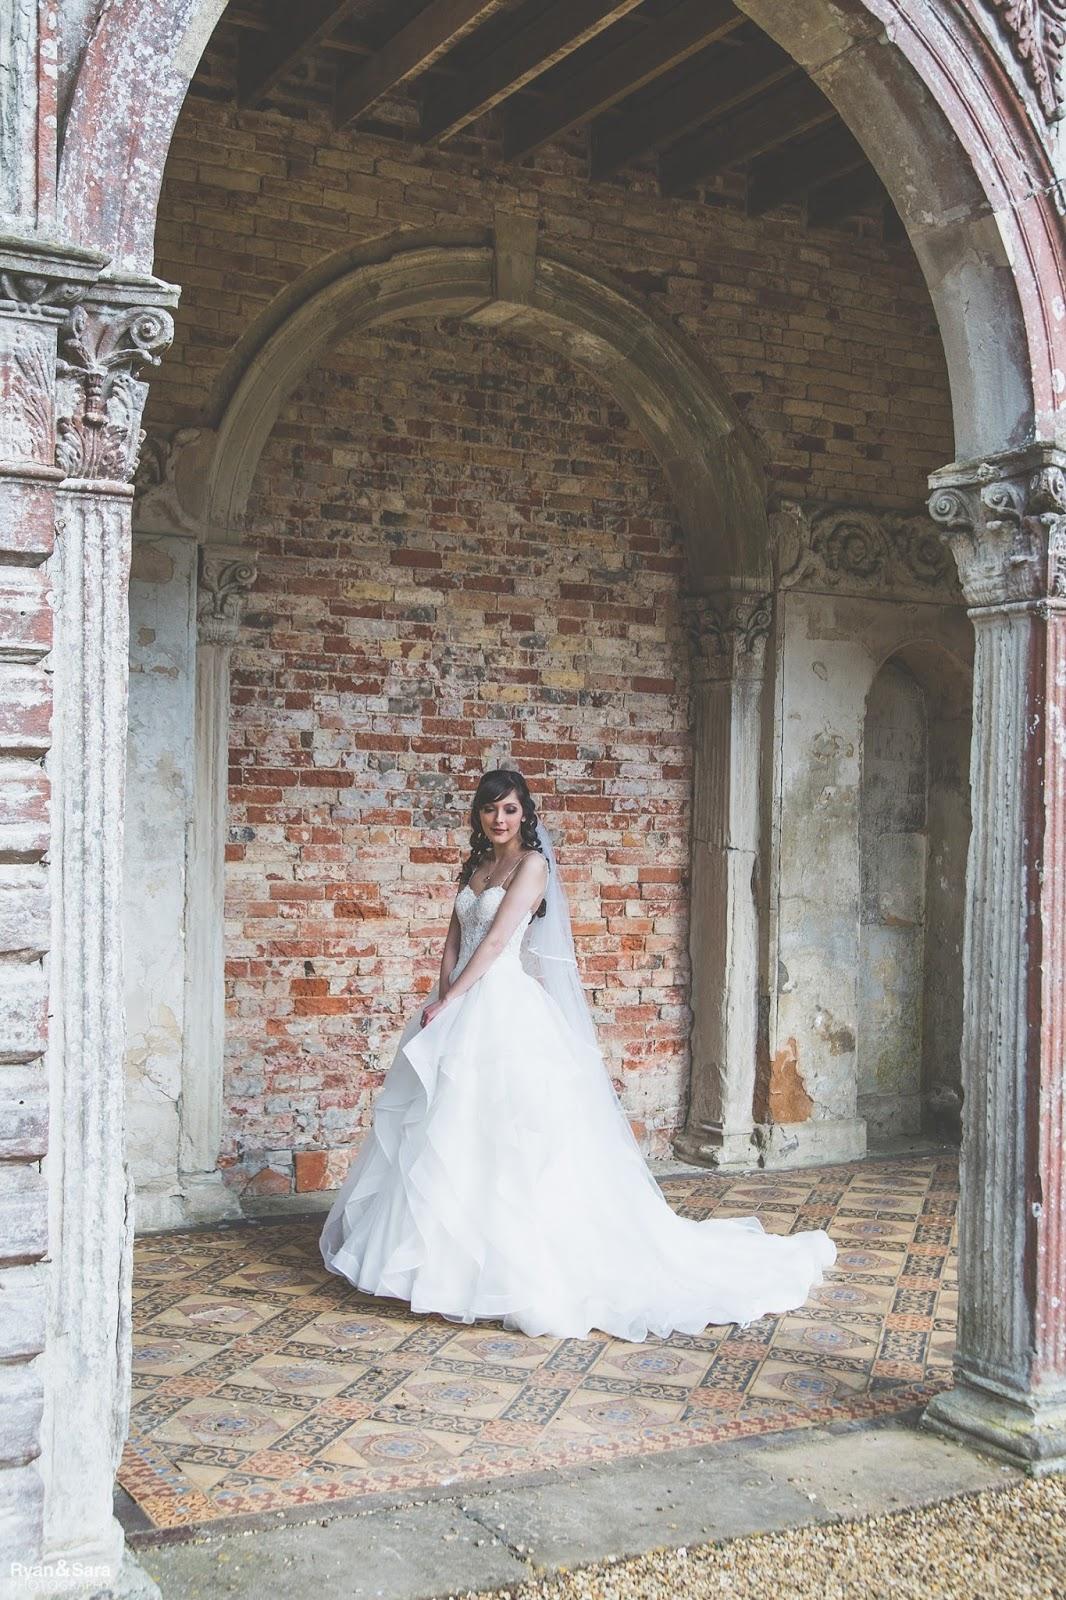 ettington park hotel, wedding dress